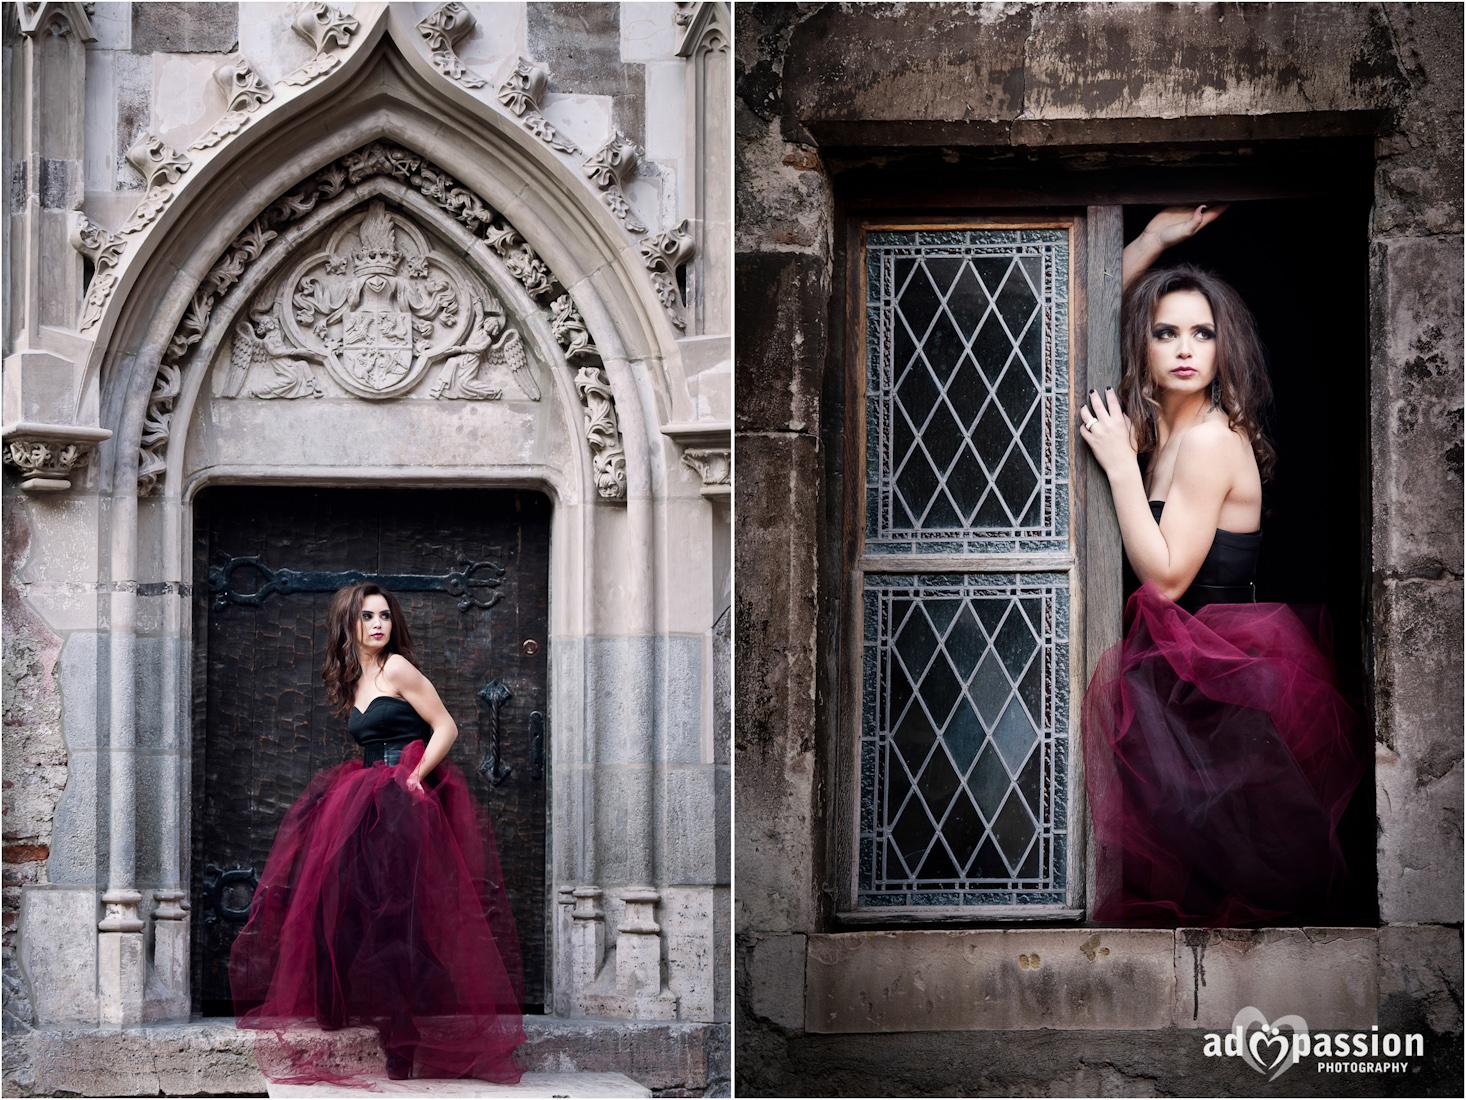 AD Passion Photography | alexandra_castelul_huniazilor_021 | Adelin, Dida, fotograf profesionist, fotograf de nunta, fotografie de nunta, fotograf Timisoara, fotograf Craiova, fotograf Bucuresti, fotograf Arad, nunta Timisoara, nunta Arad, nunta Bucuresti, nunta Craiova